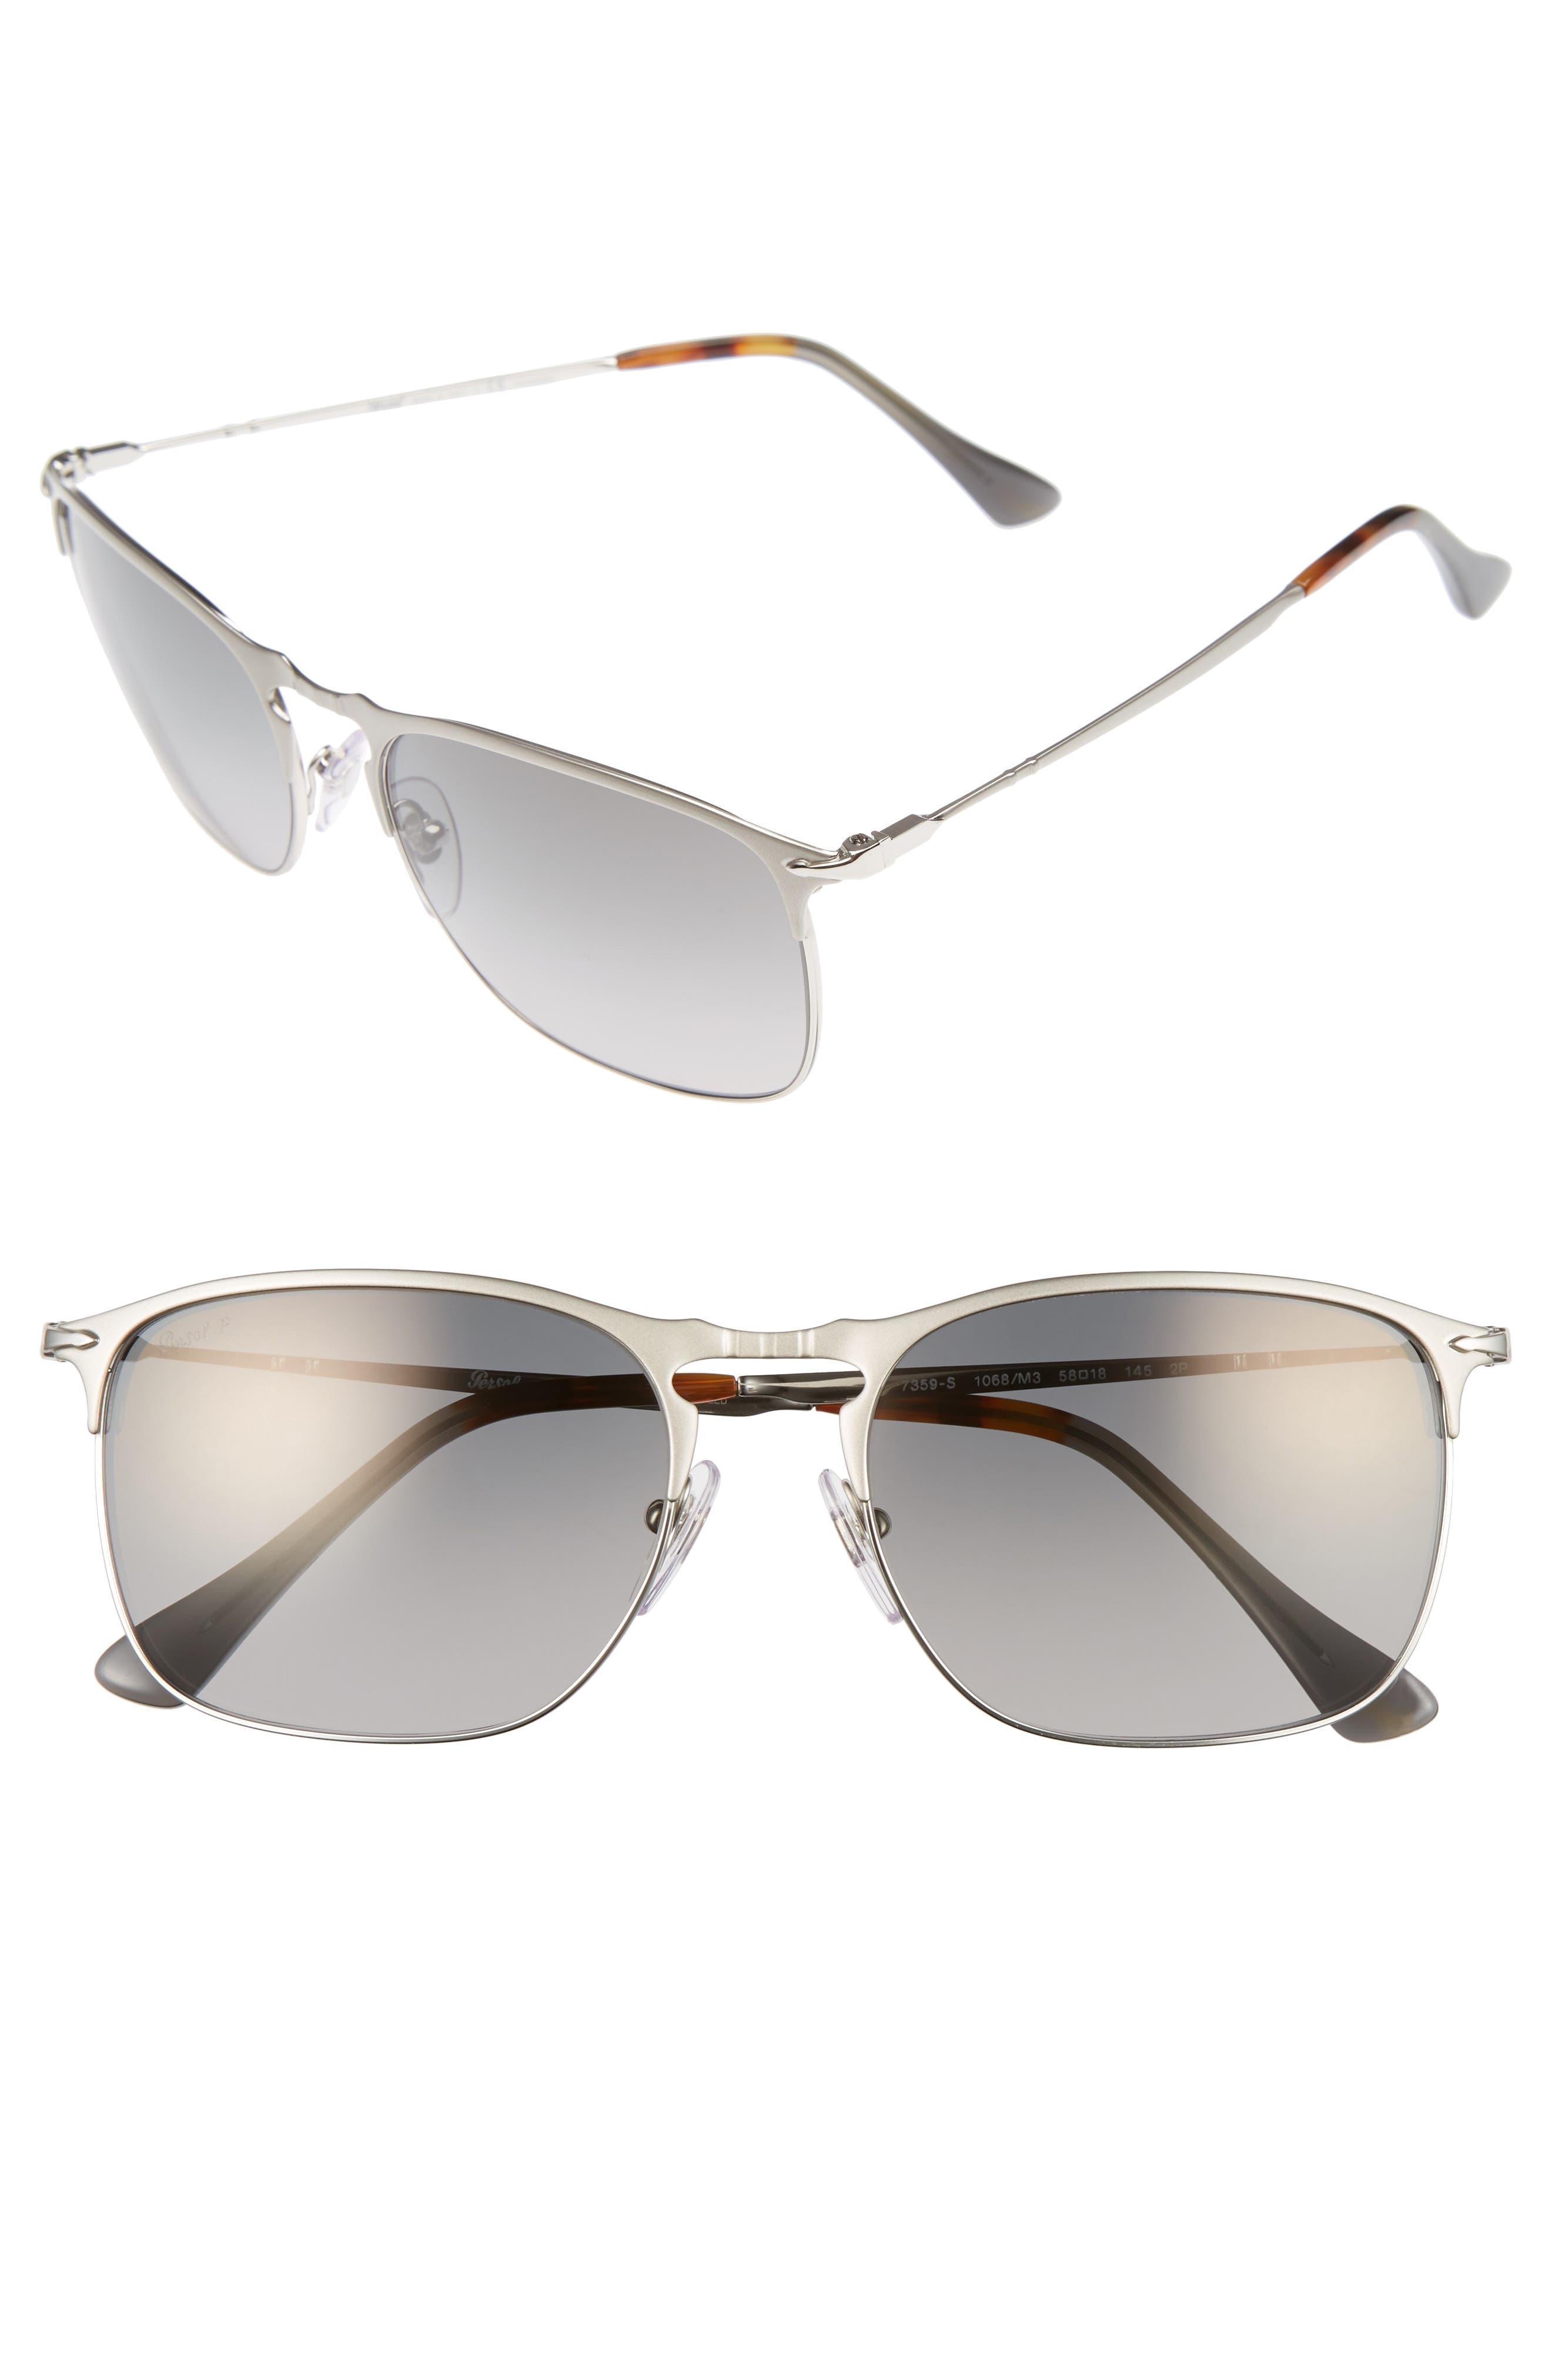 Evolution 58mm Polarized Aviator Sunglasses,                             Main thumbnail 1, color,